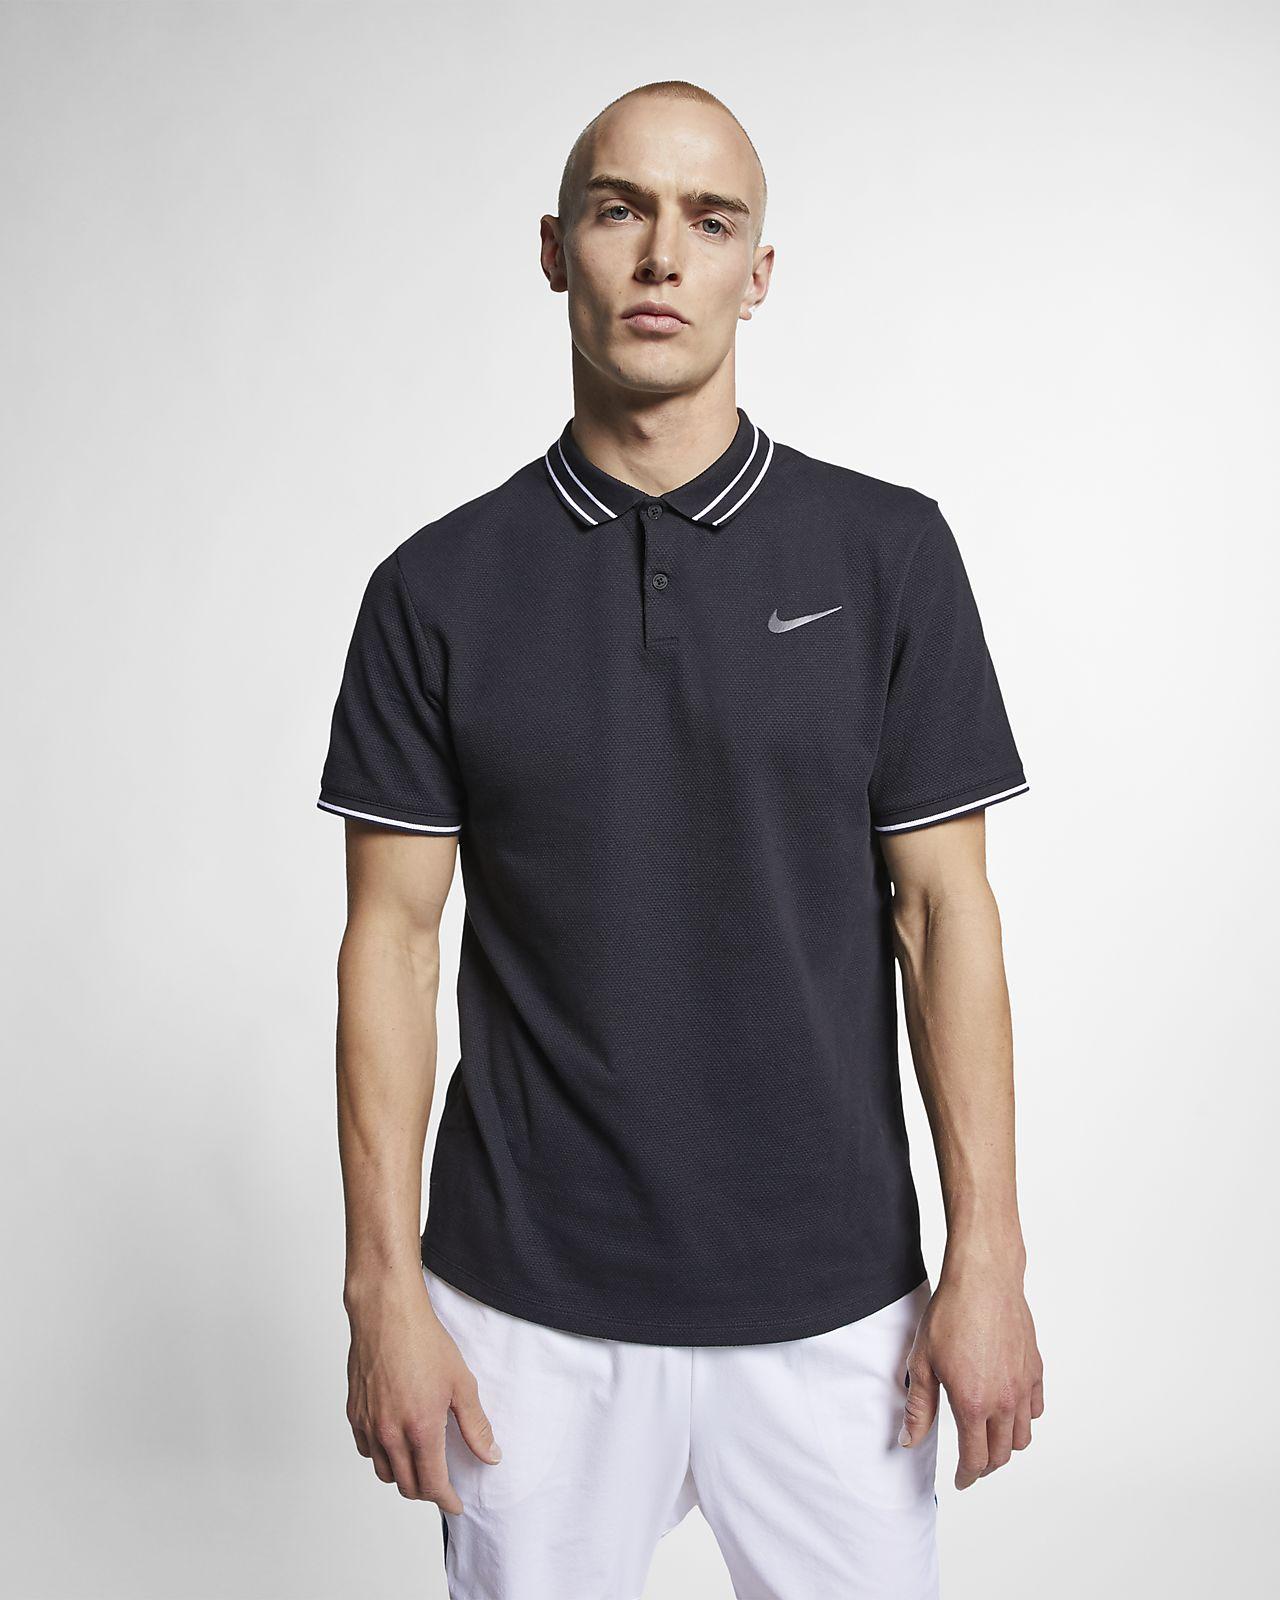 94415847 Nike Mens Tennis Polo Shirts - DREAMWORKS